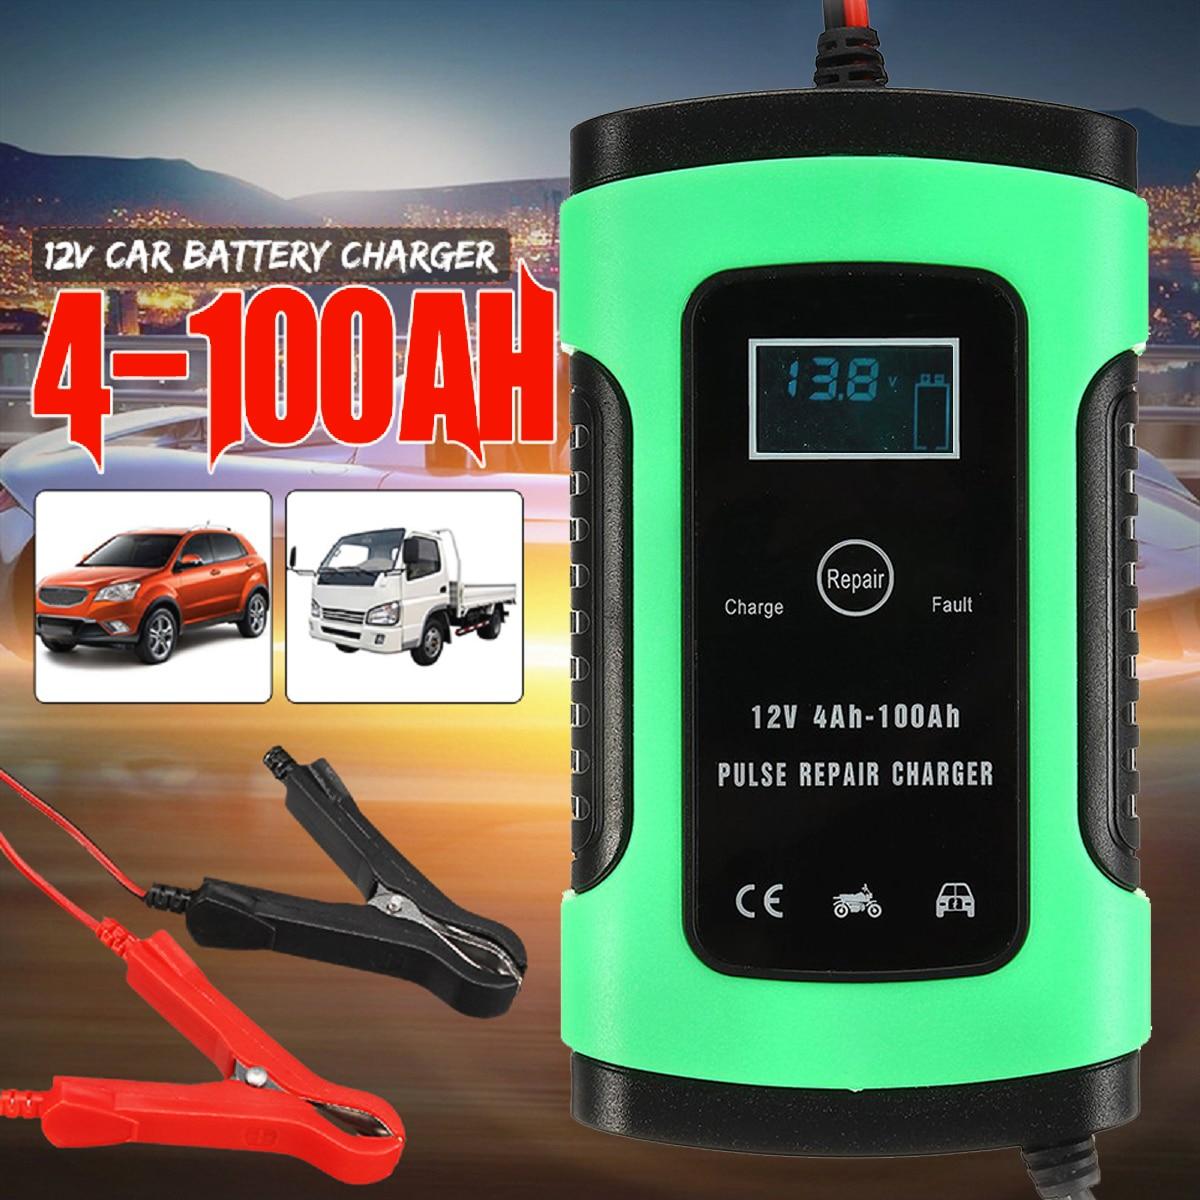 12V 5A 自動車インテリジェントバッテリー充電器ジャンプスターター液晶インテリジェント 100-240V 100AH パルス修理タイプ